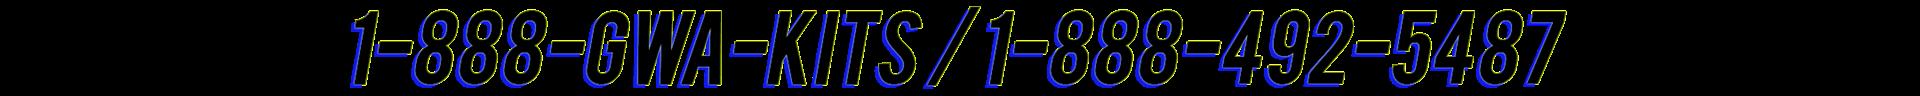 1-888-492-5487